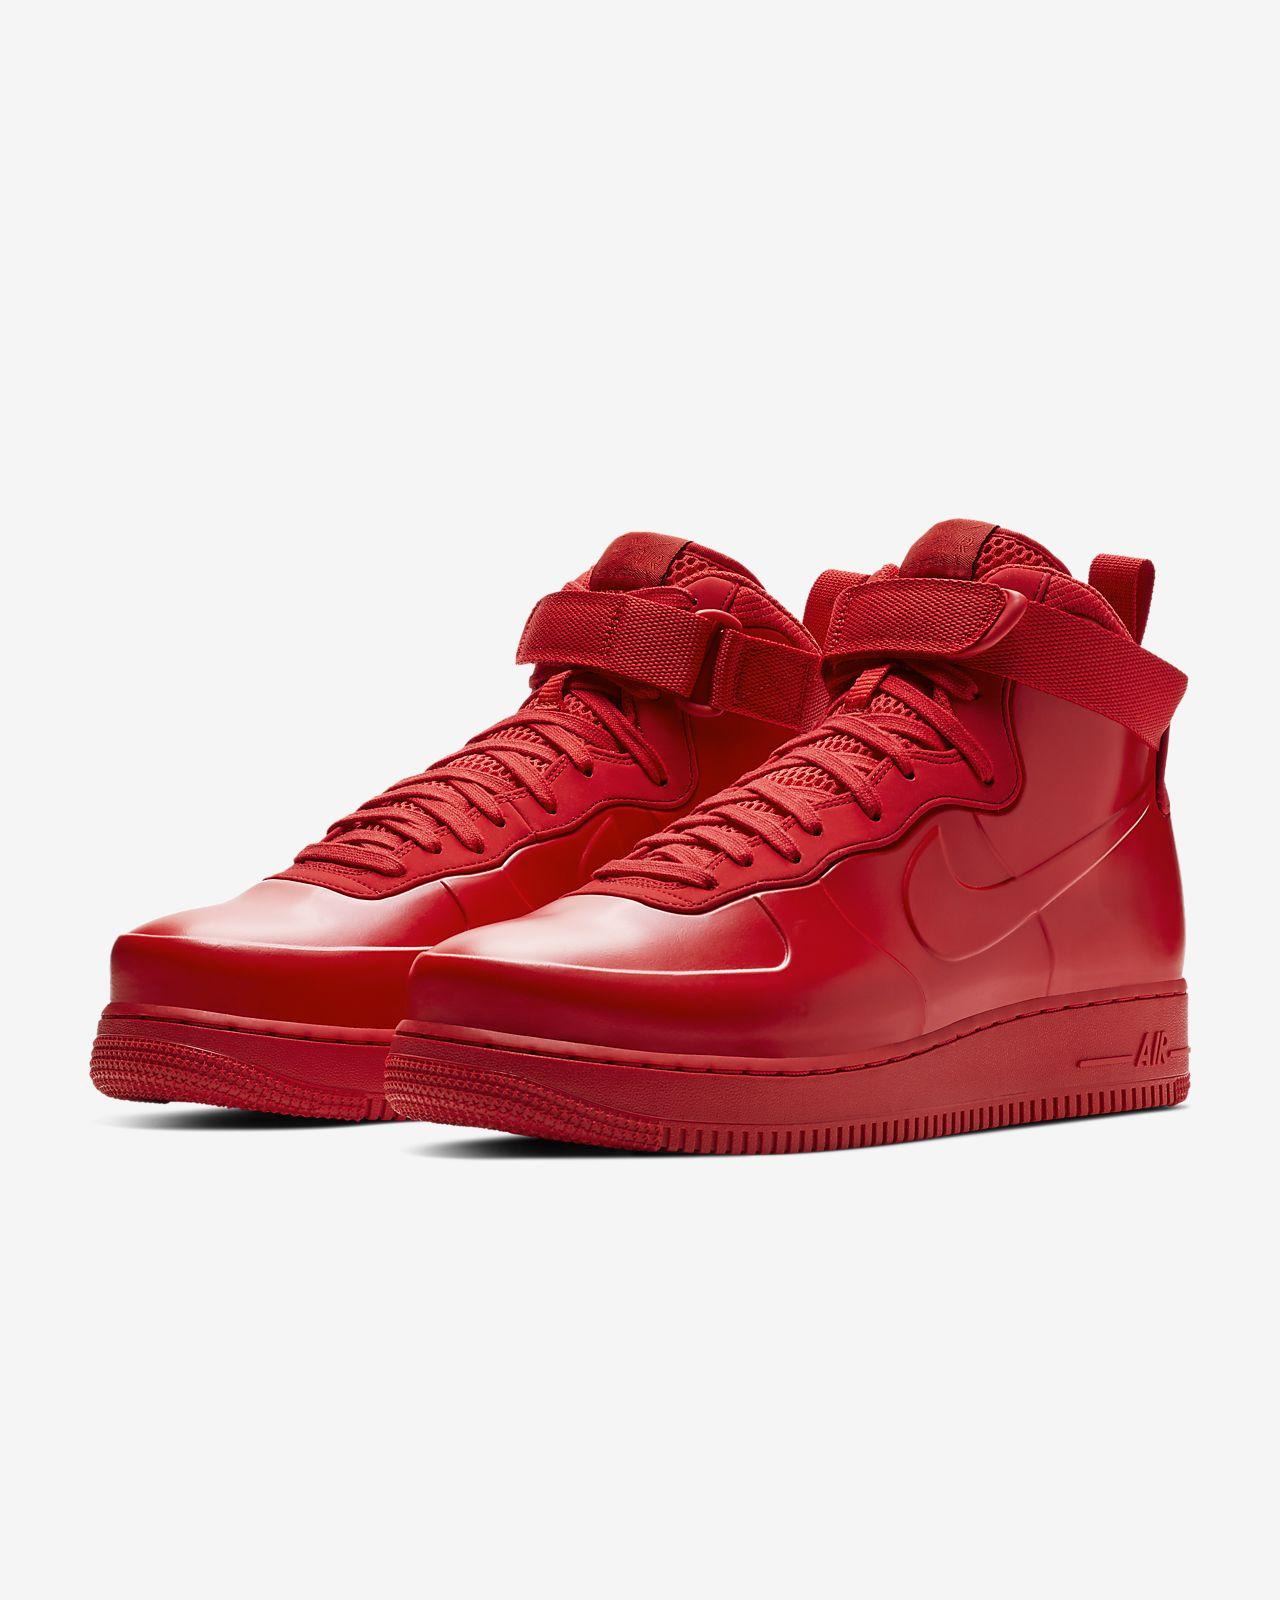 innovative design 0bd1a 55db0 ... Nike Air Force 1 Foamposite Cupsole Men s Shoe